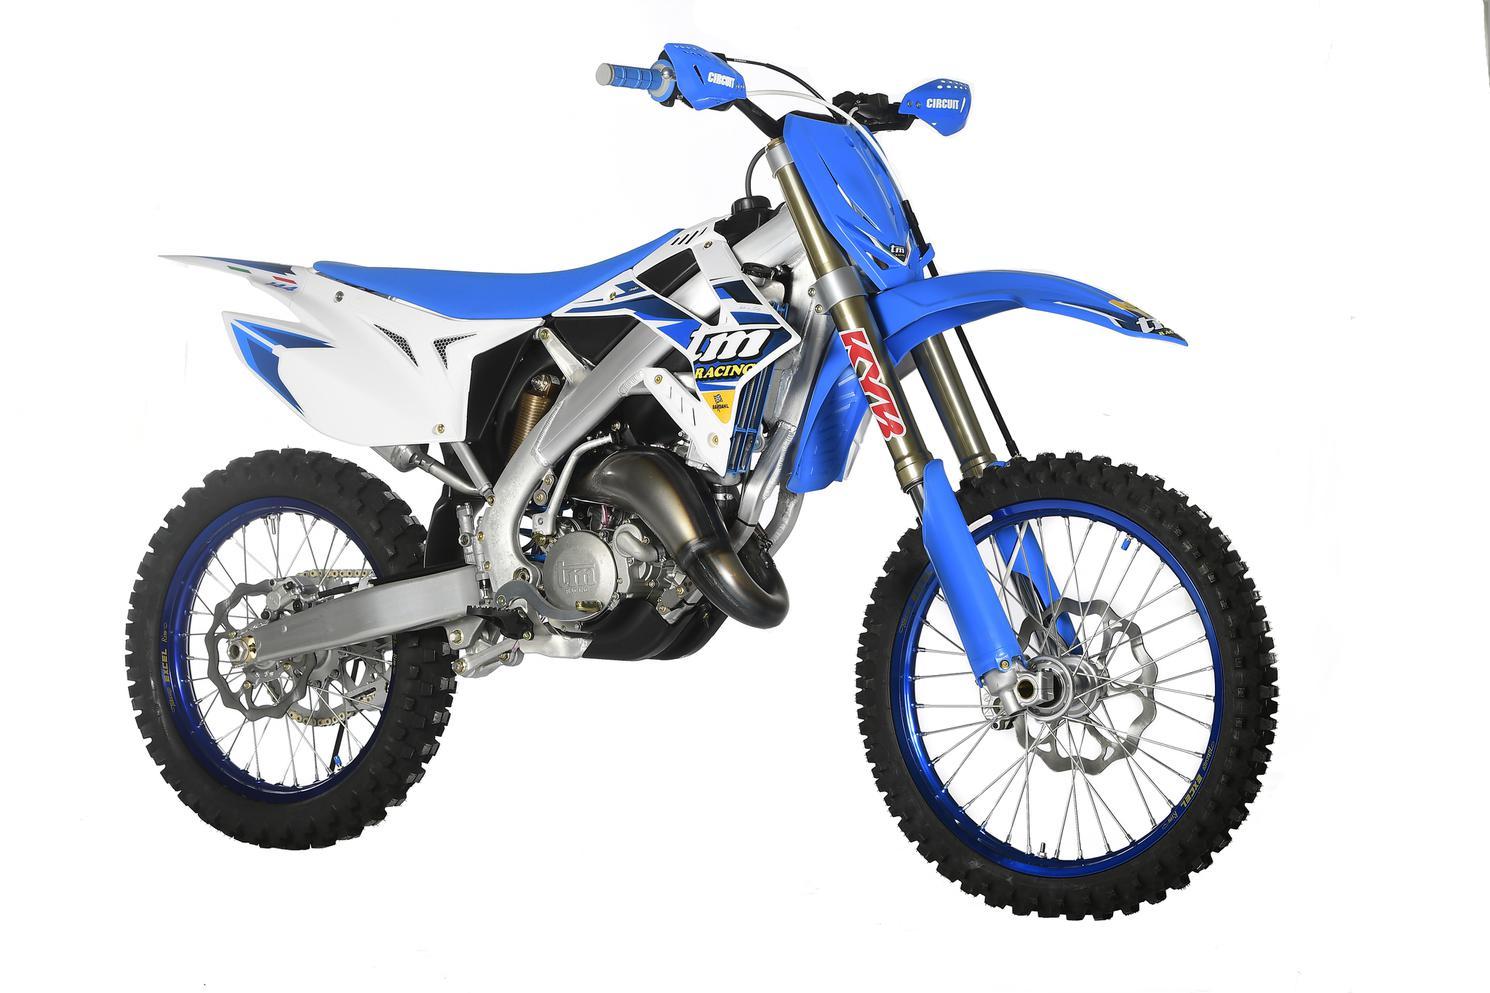 TM TM Racing 144 MX 2022 - 2 temps